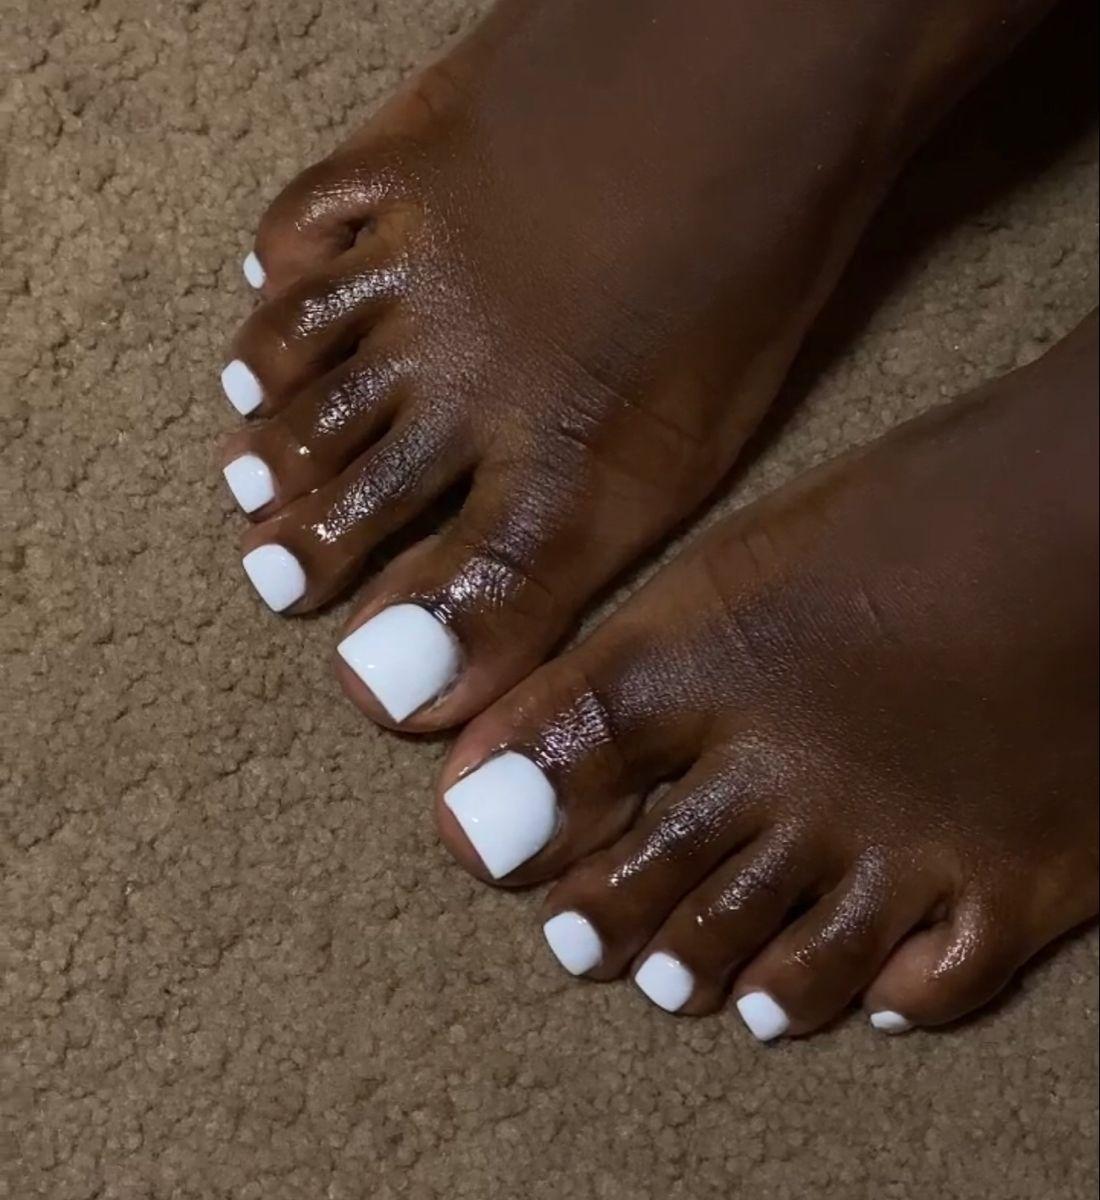 Pin by Nailah Daniel on Claws | Acrylic toe nails, Gel toe